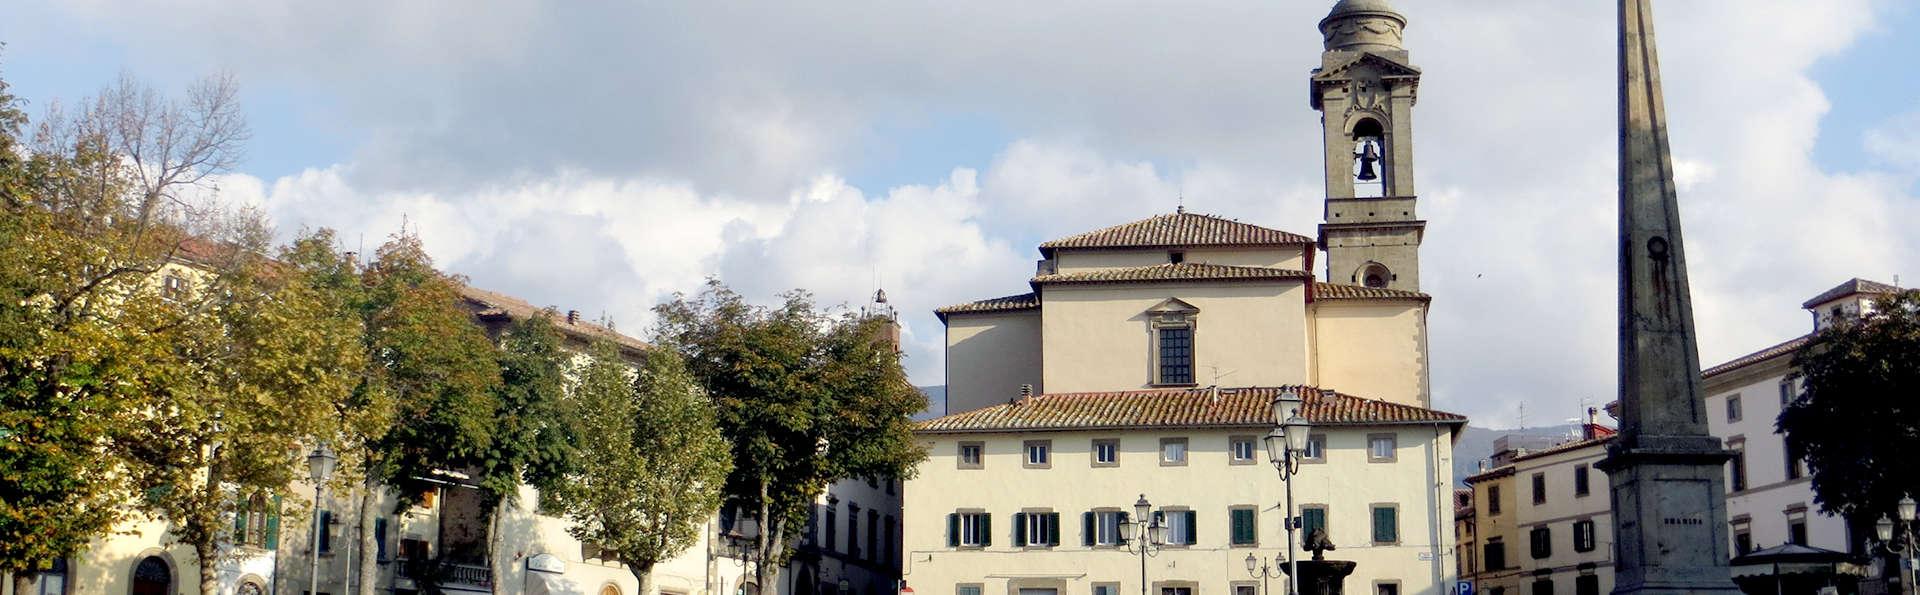 Grand Hotel Impero Spa & Resort - Edit_CastelDiPiano.jpg